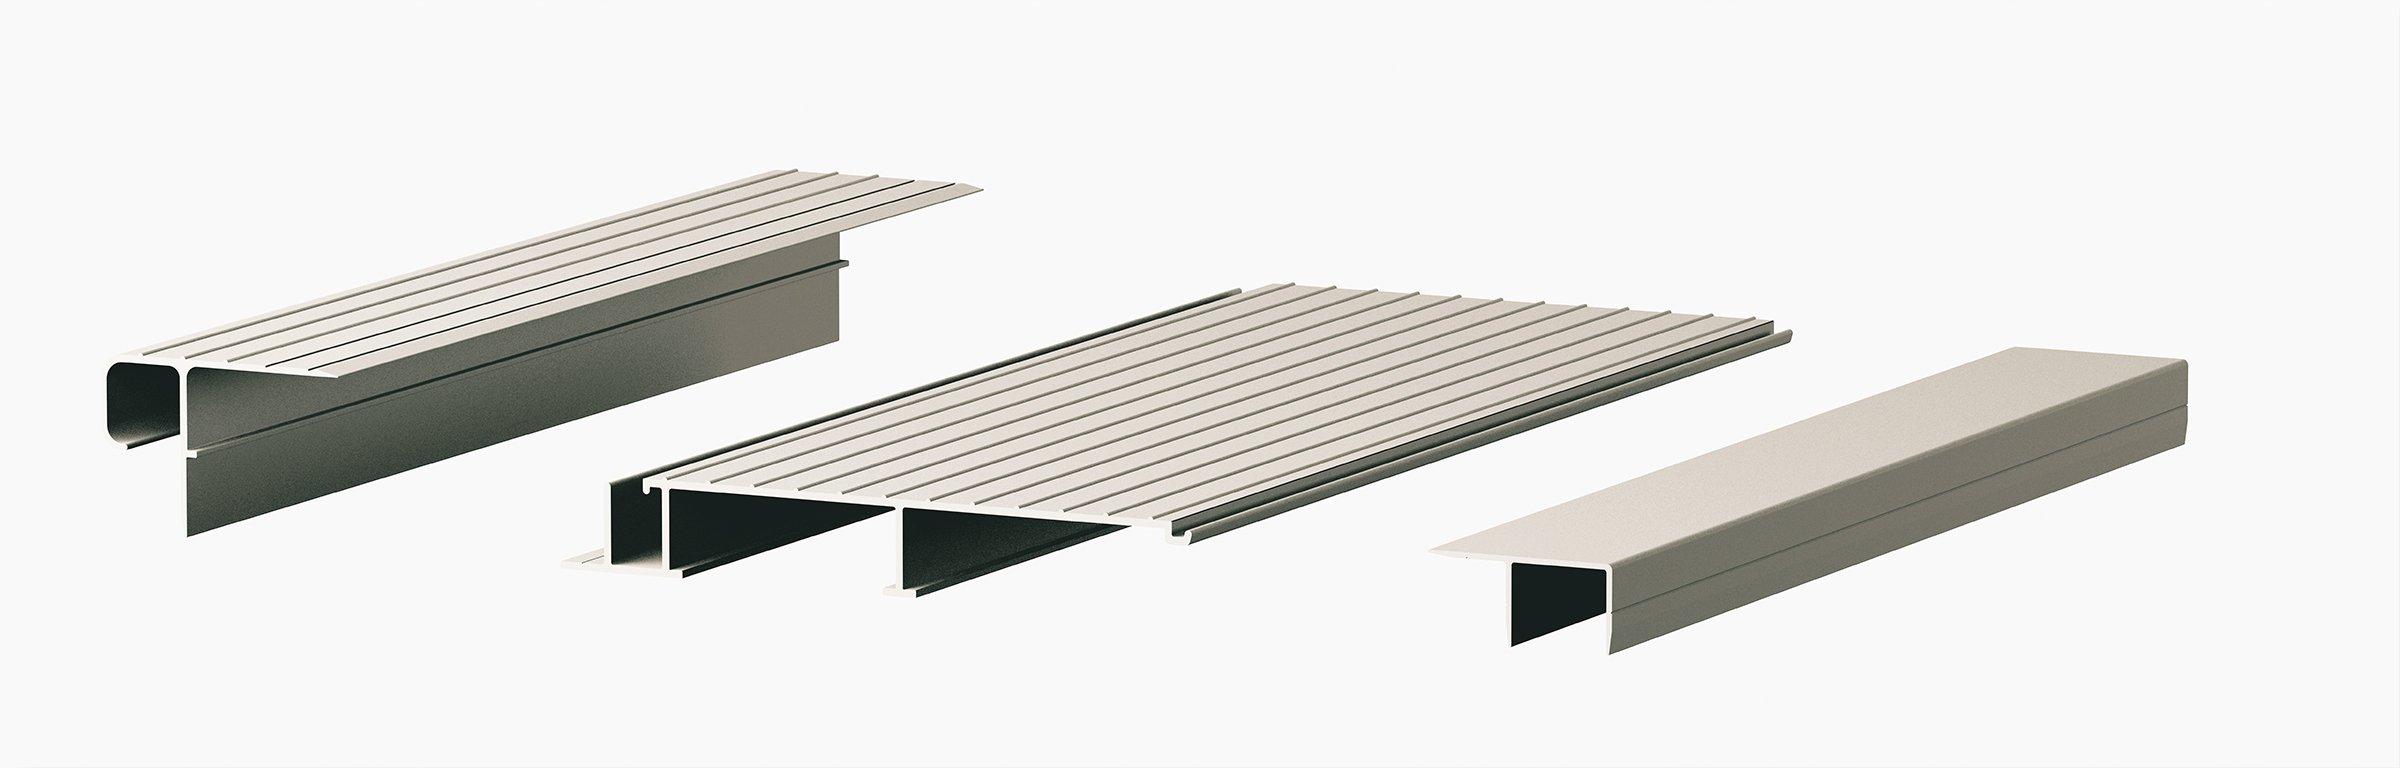 Aluminum Decking Board Profile-3